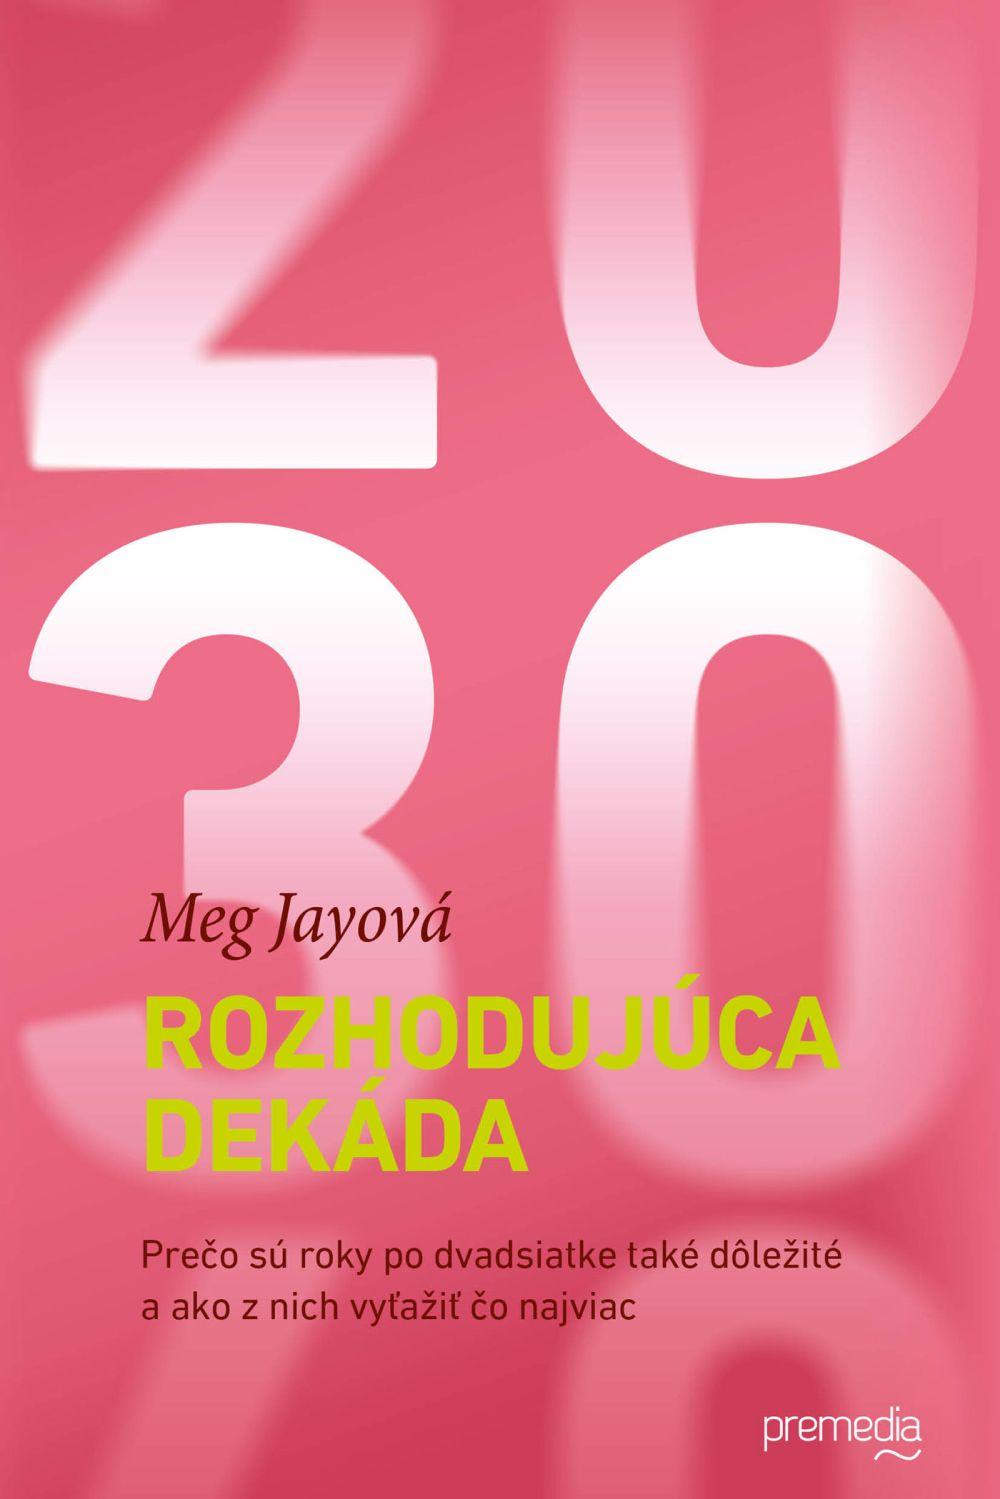 meg_jayova_rozhodujuca_dekada